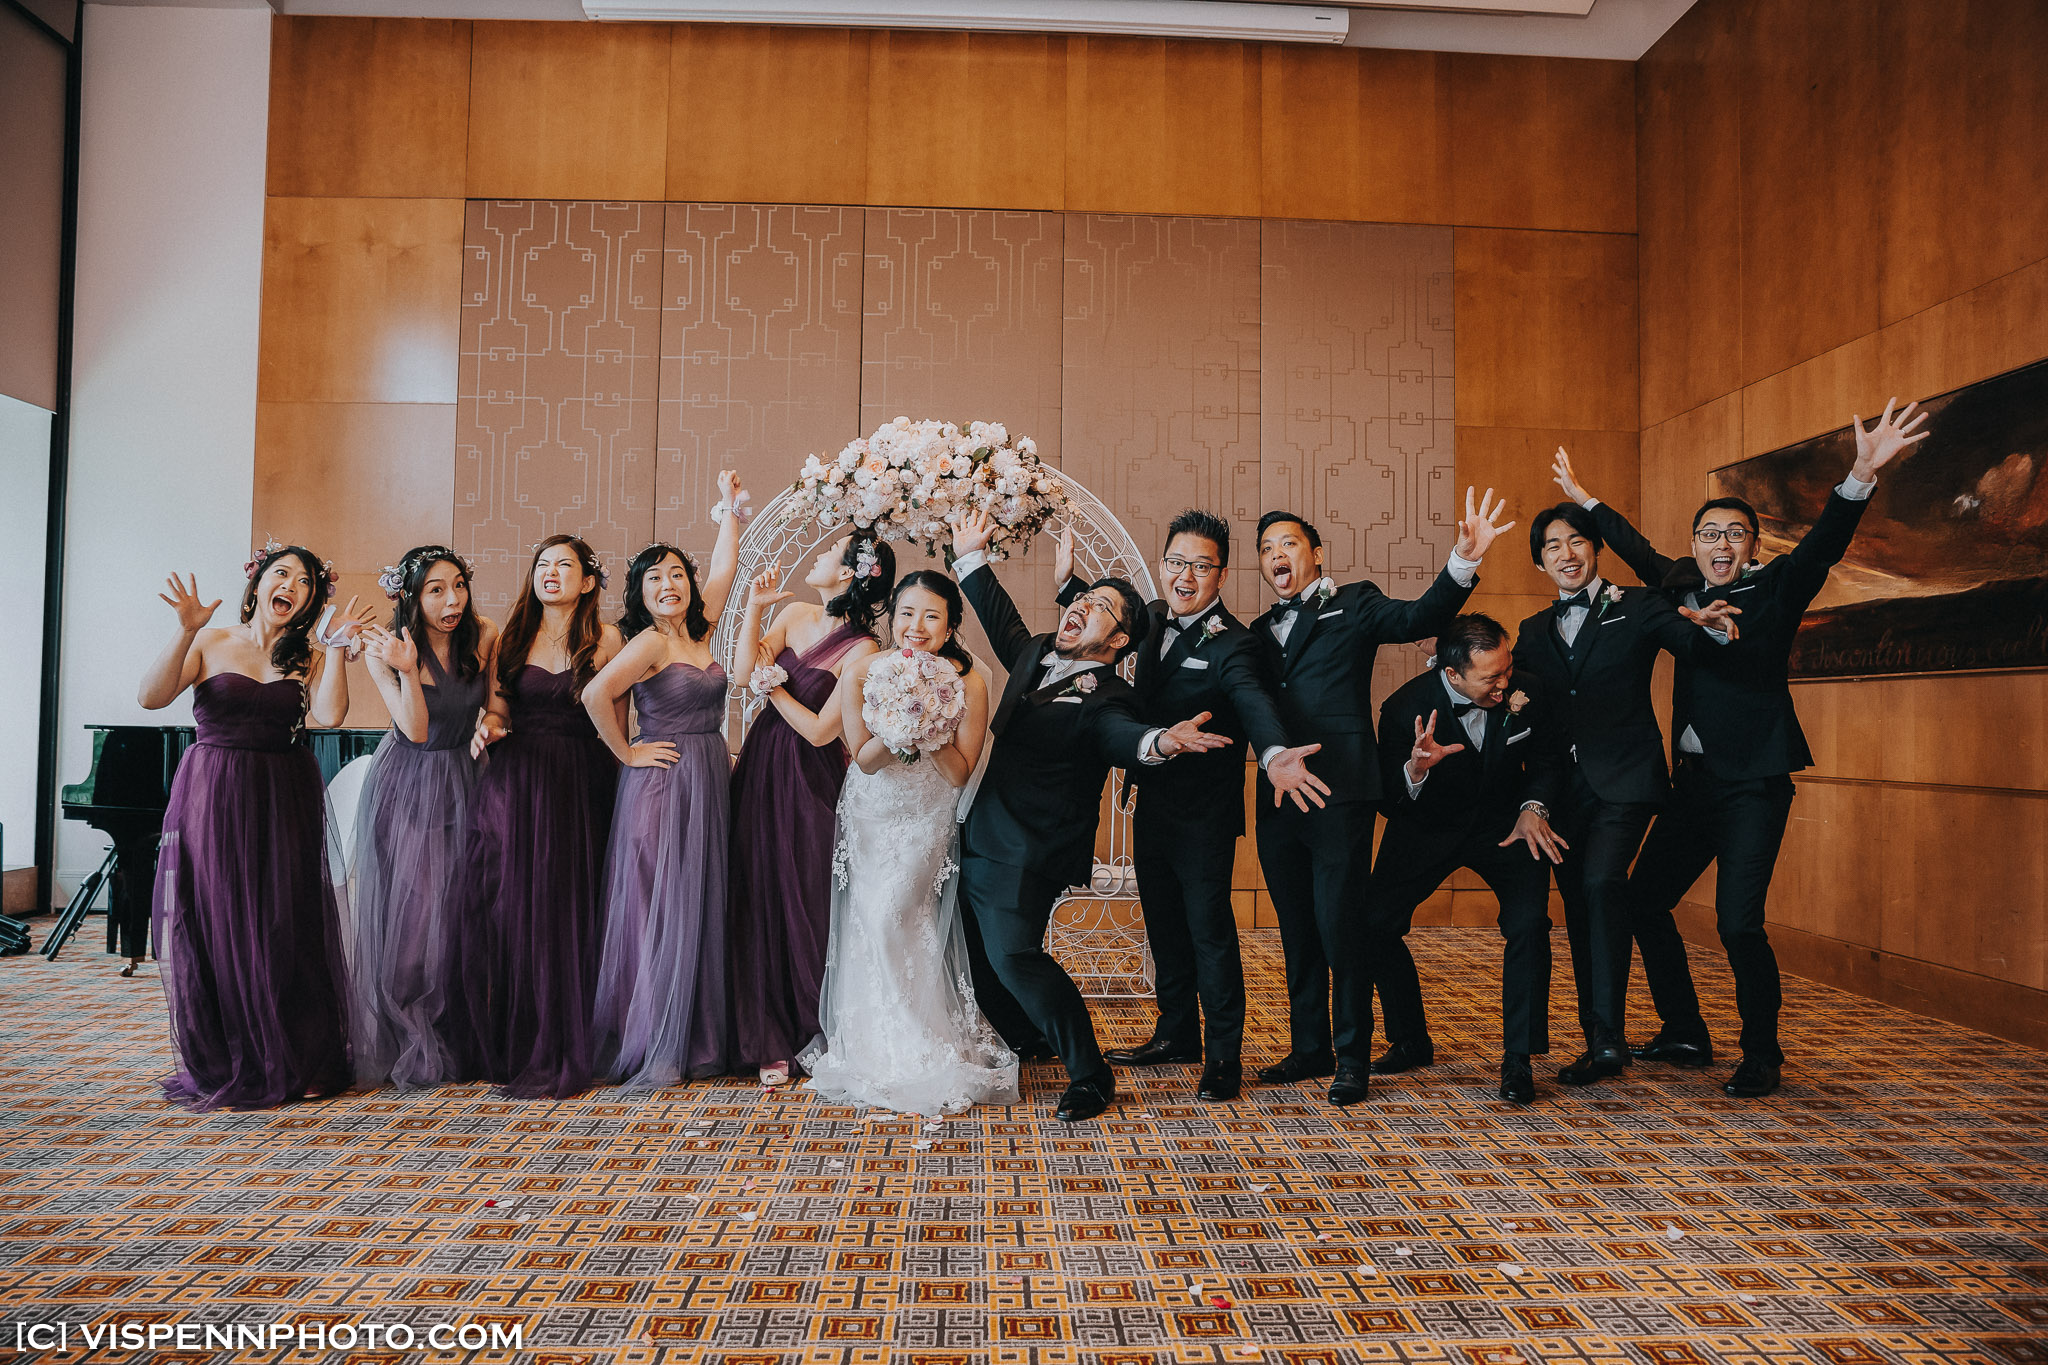 WEDDING DAY Photography Melbourne VISPENN 墨尔本 婚礼跟拍 婚礼摄像 婚礼摄影 结婚照 登记照 1DX 3852